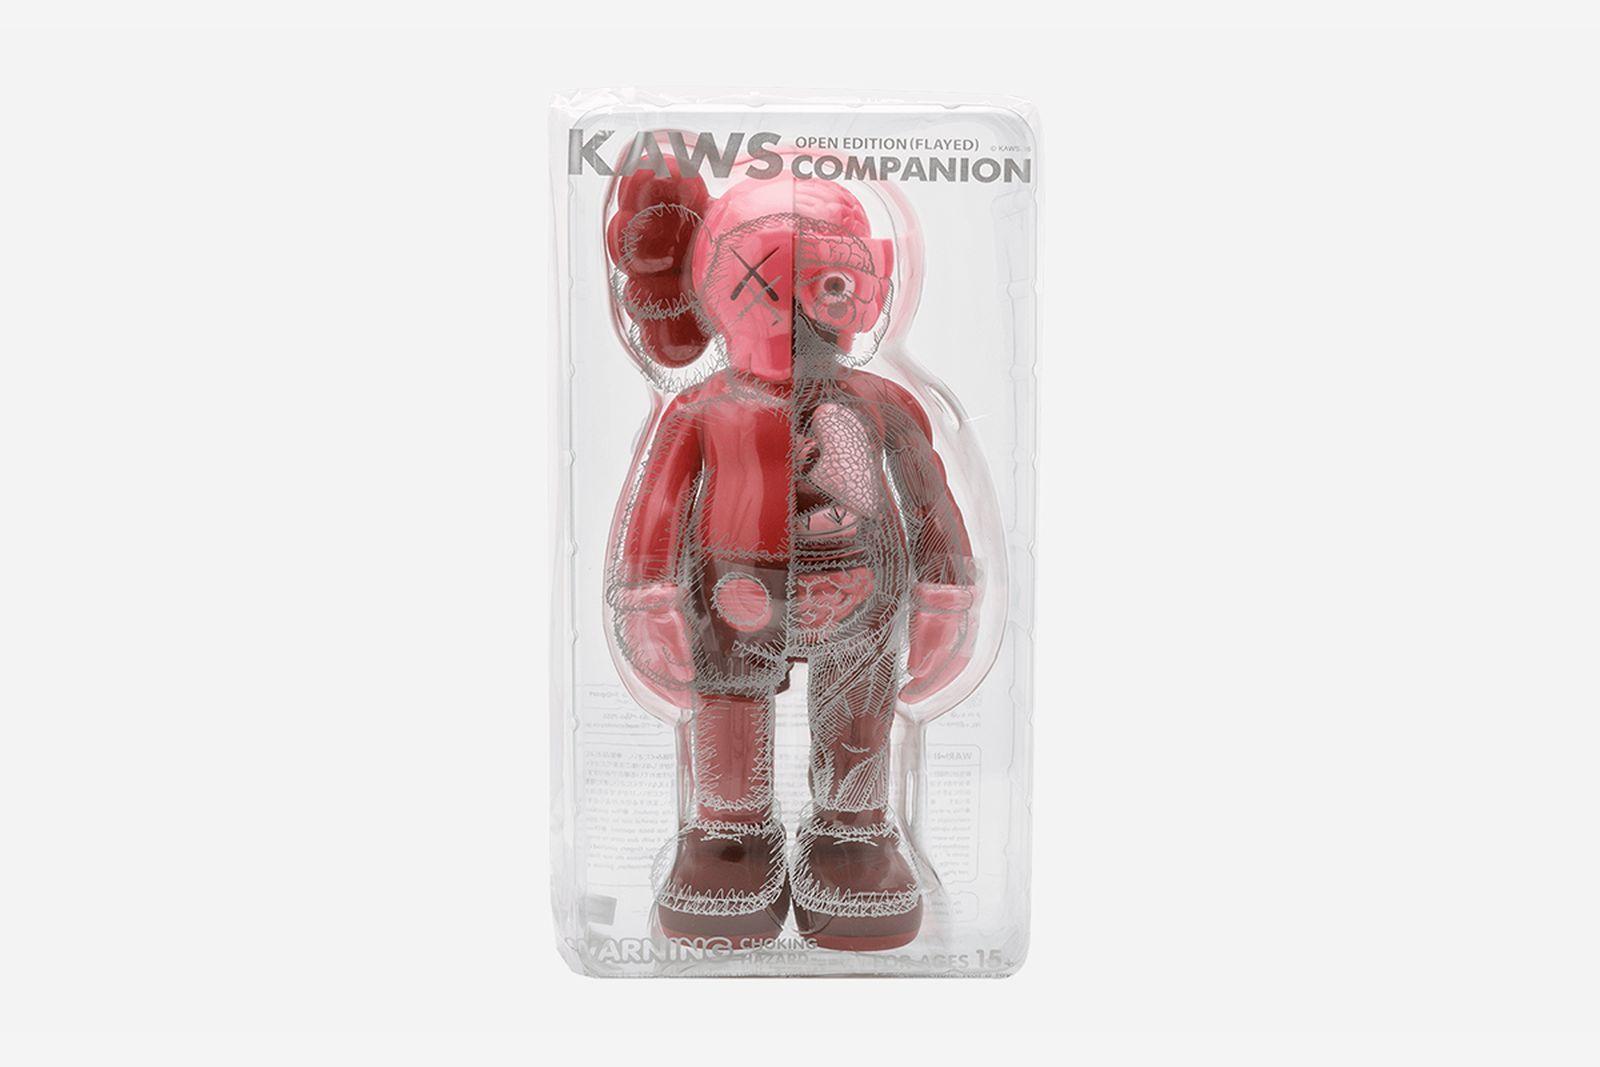 Medicom Toy x KAWS Companion Flayed